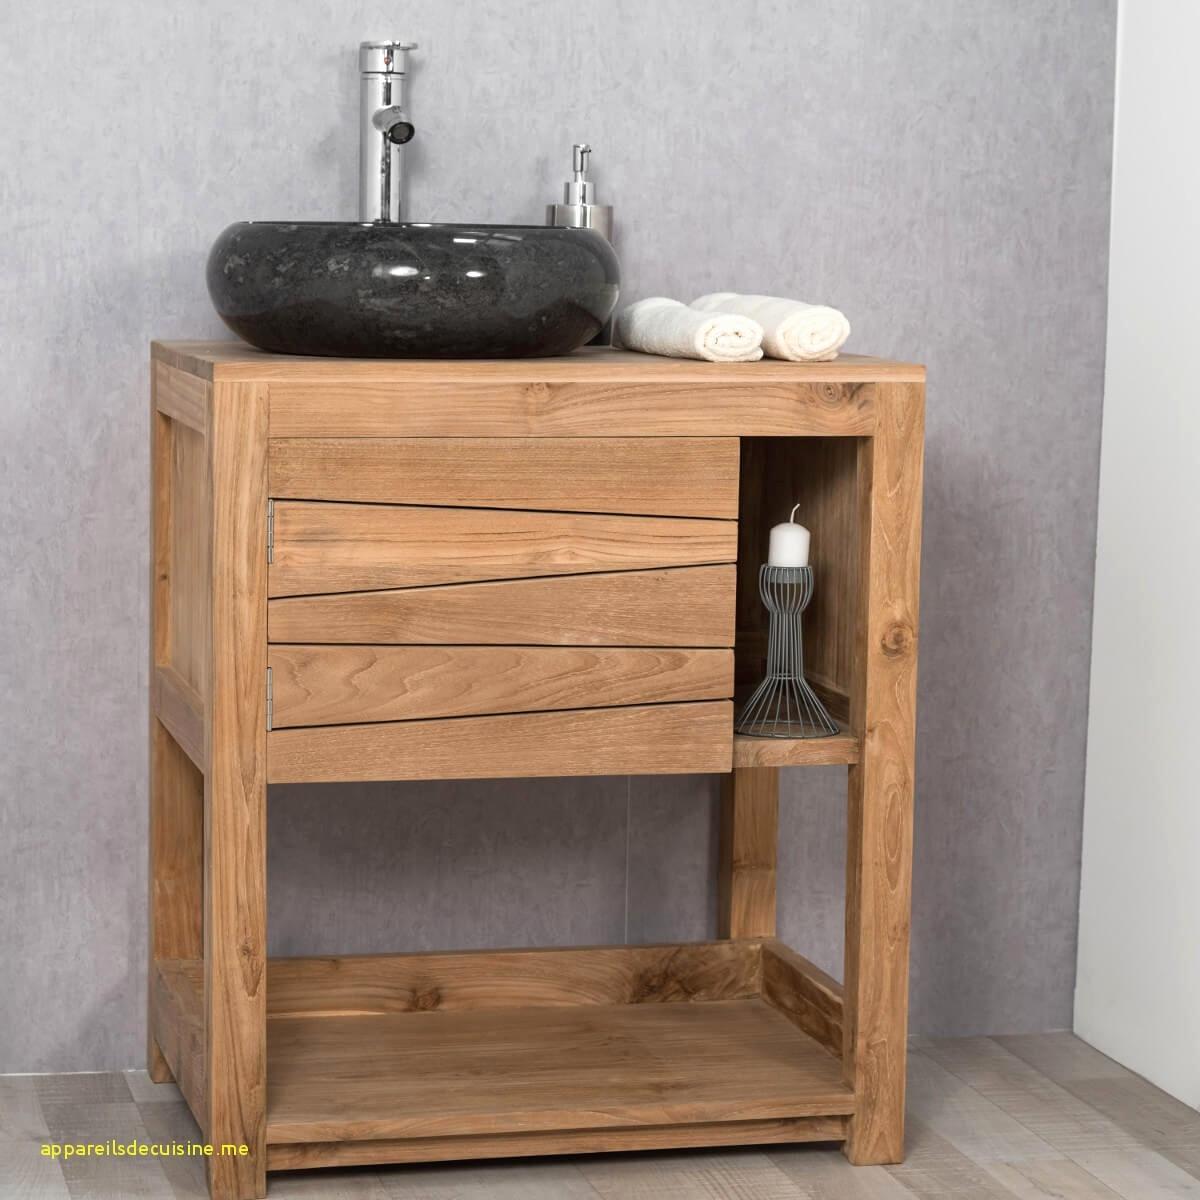 Ikea Vasque Salle De Bain Inspirant Photographie Meuble sous Vasque En Bois élégant Meuble En Teck Salle De Bain 35